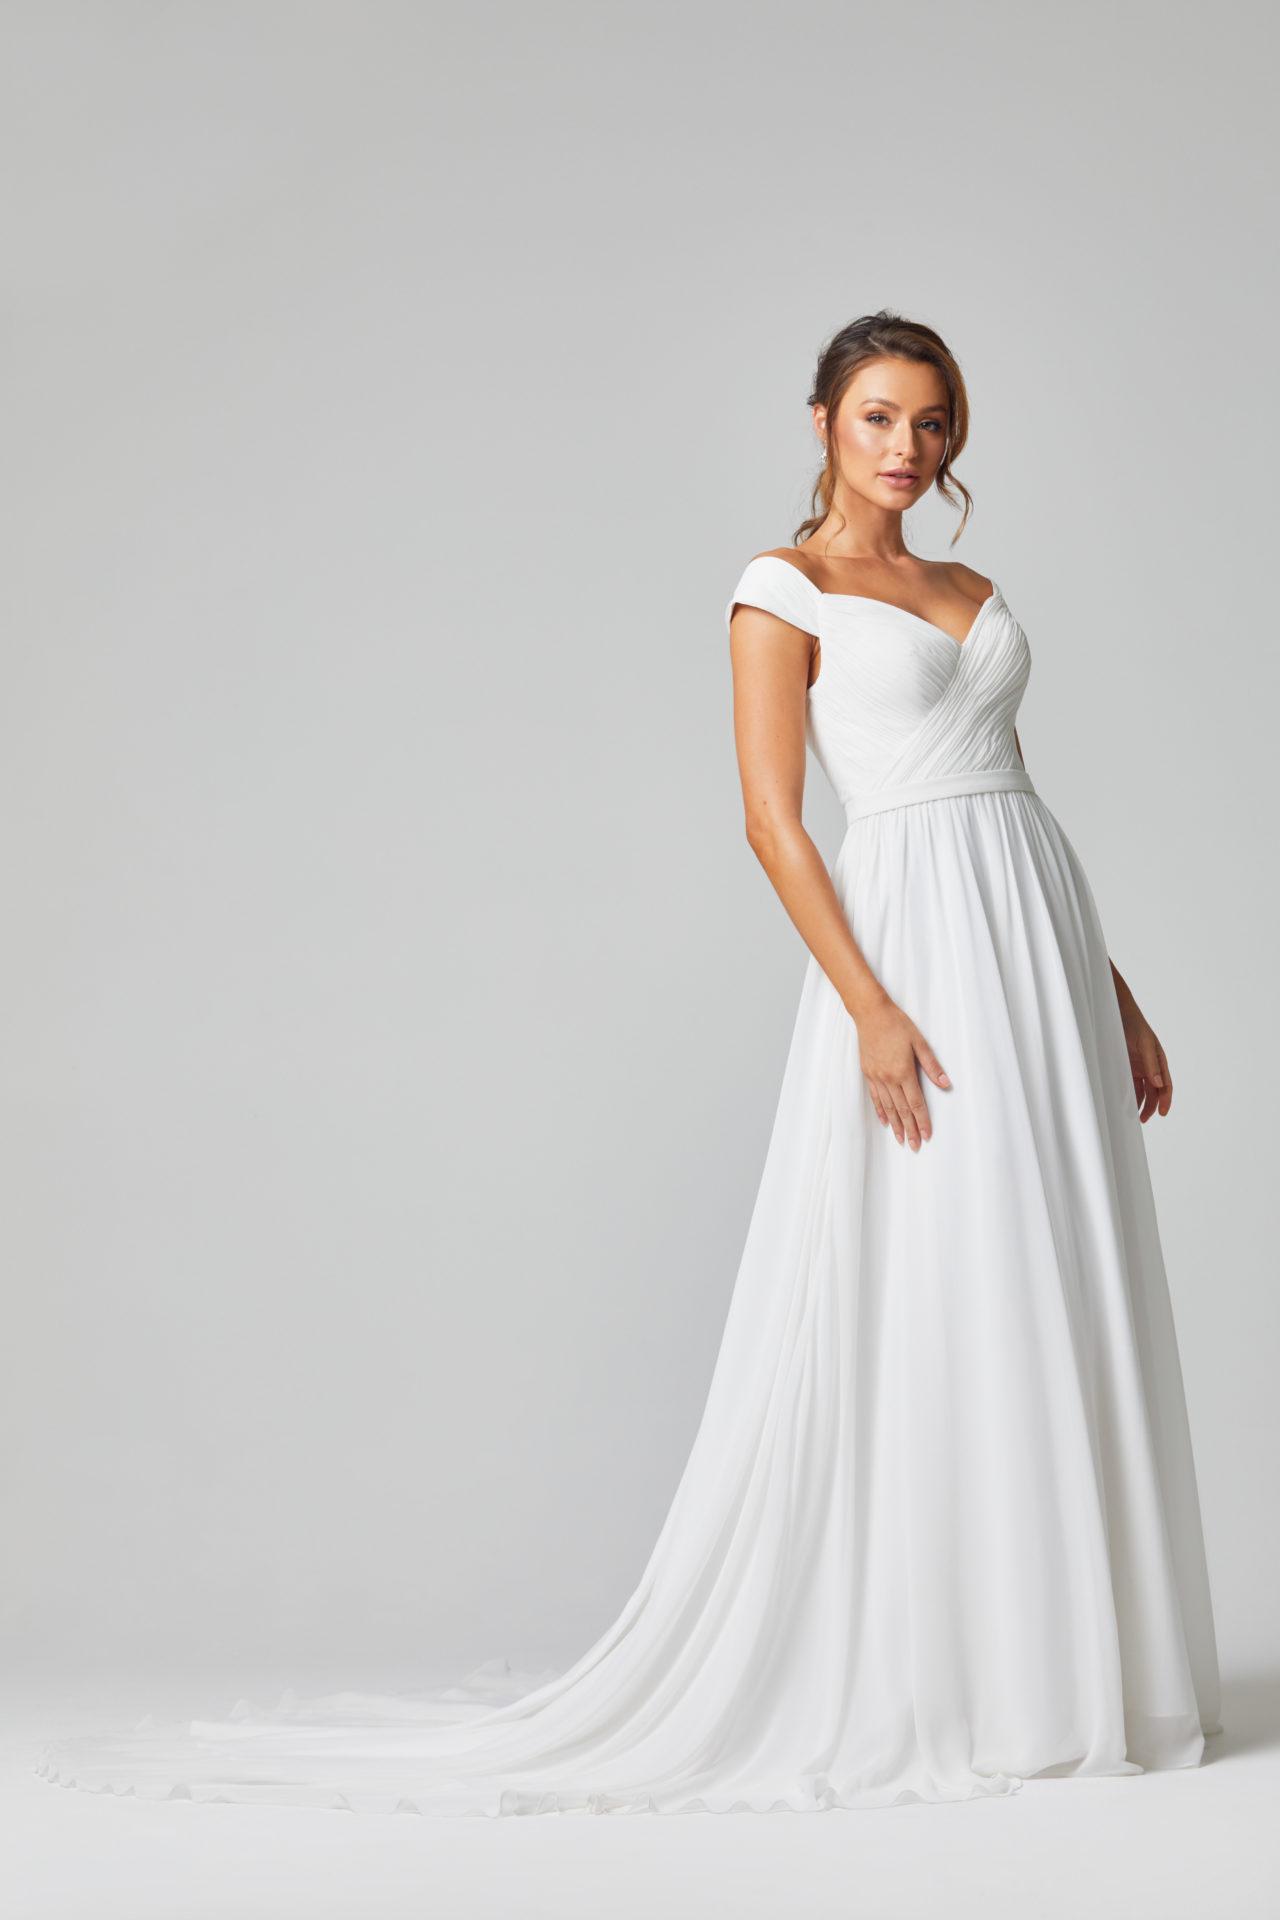 TC323 Annabelle wedding dress side